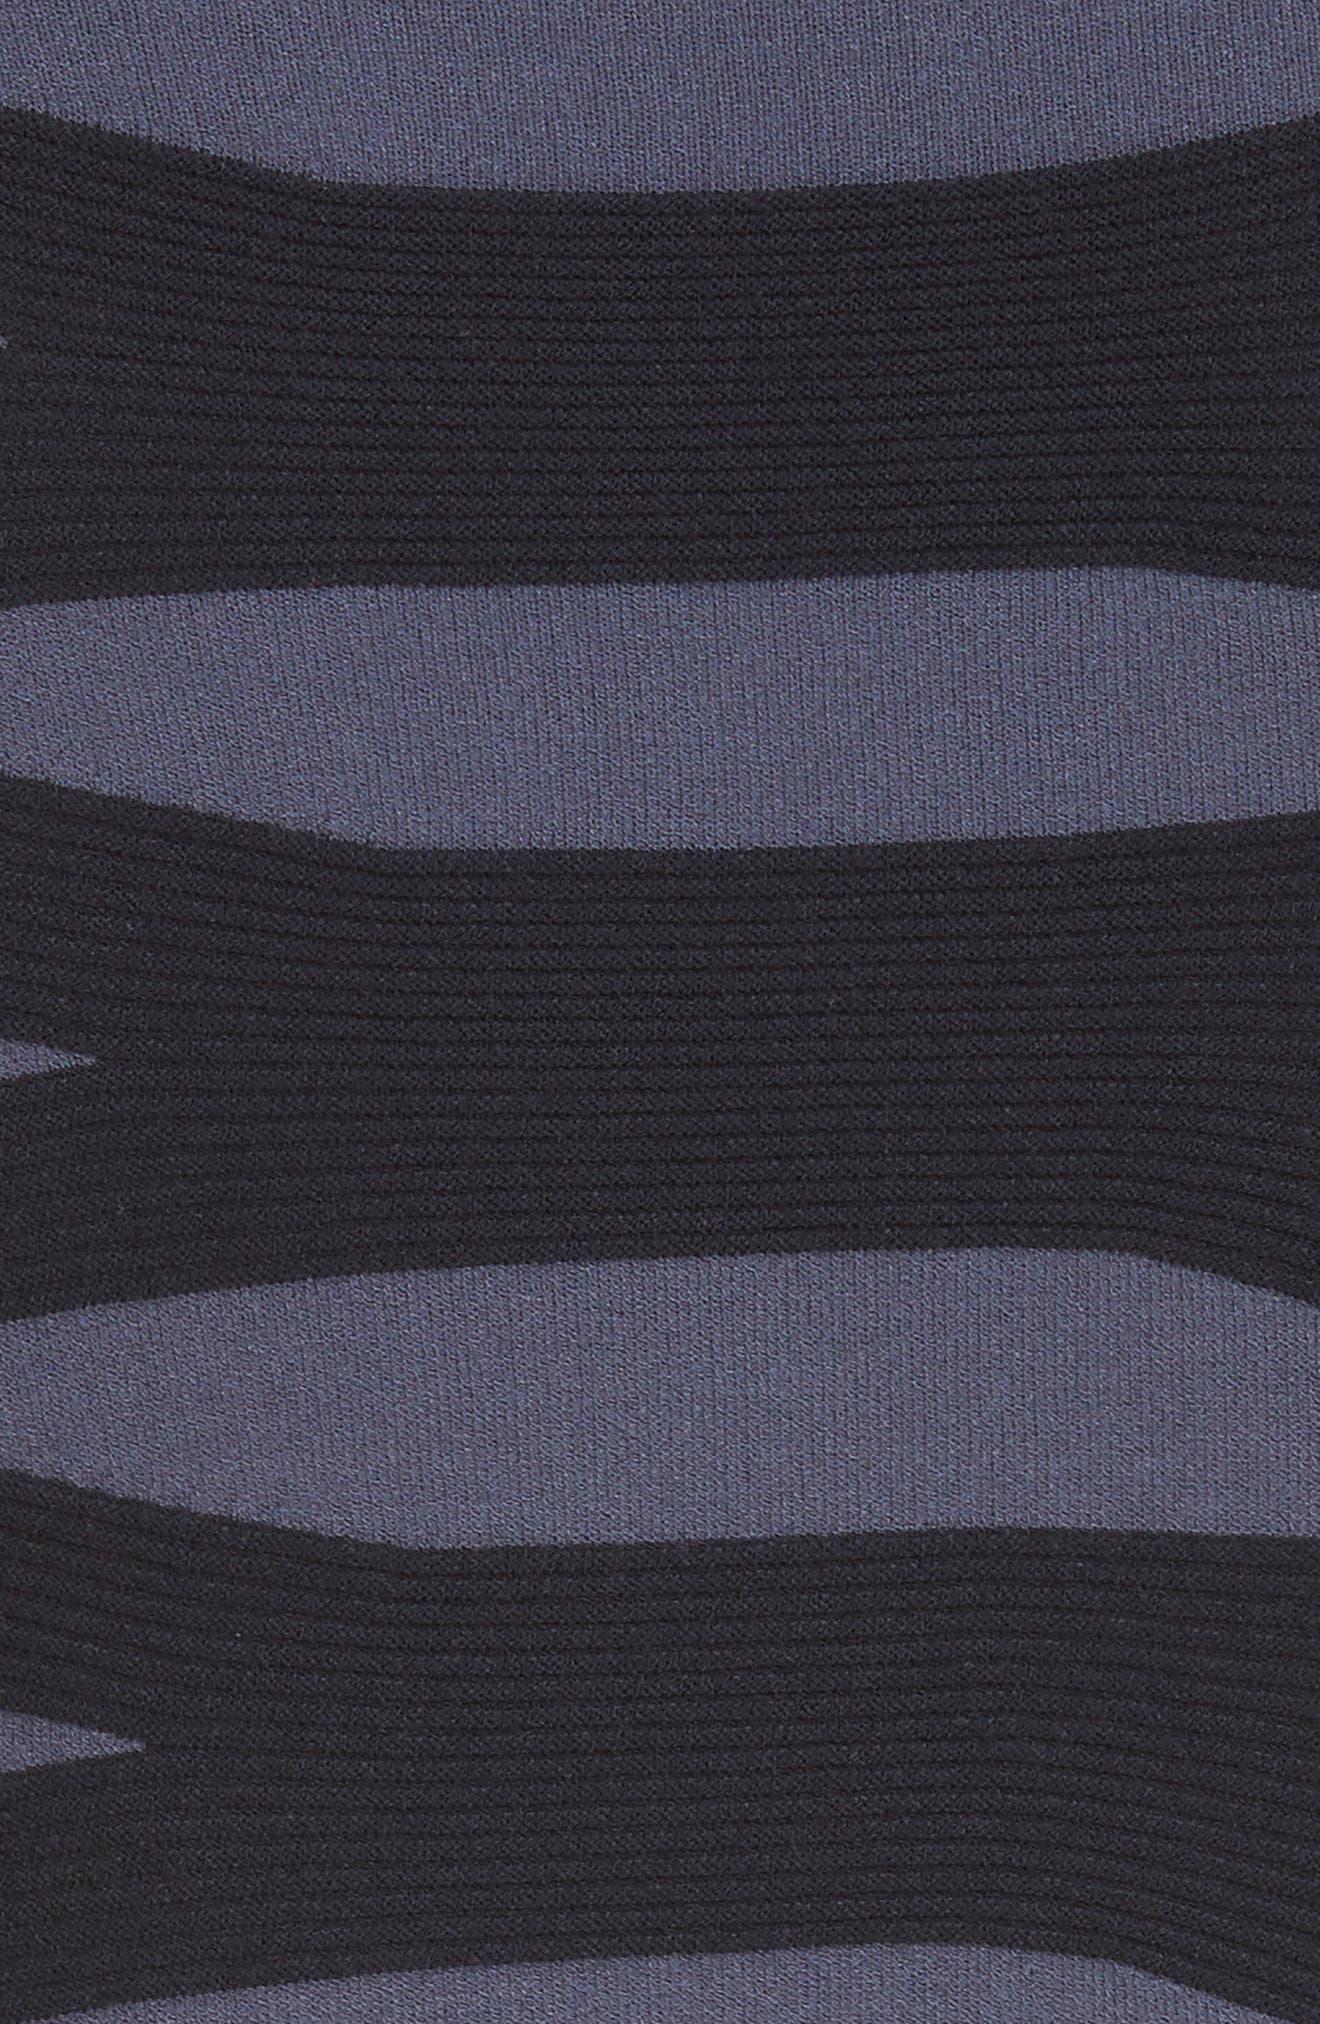 Graphic Stripe Knit Dress,                             Alternate thumbnail 5, color,